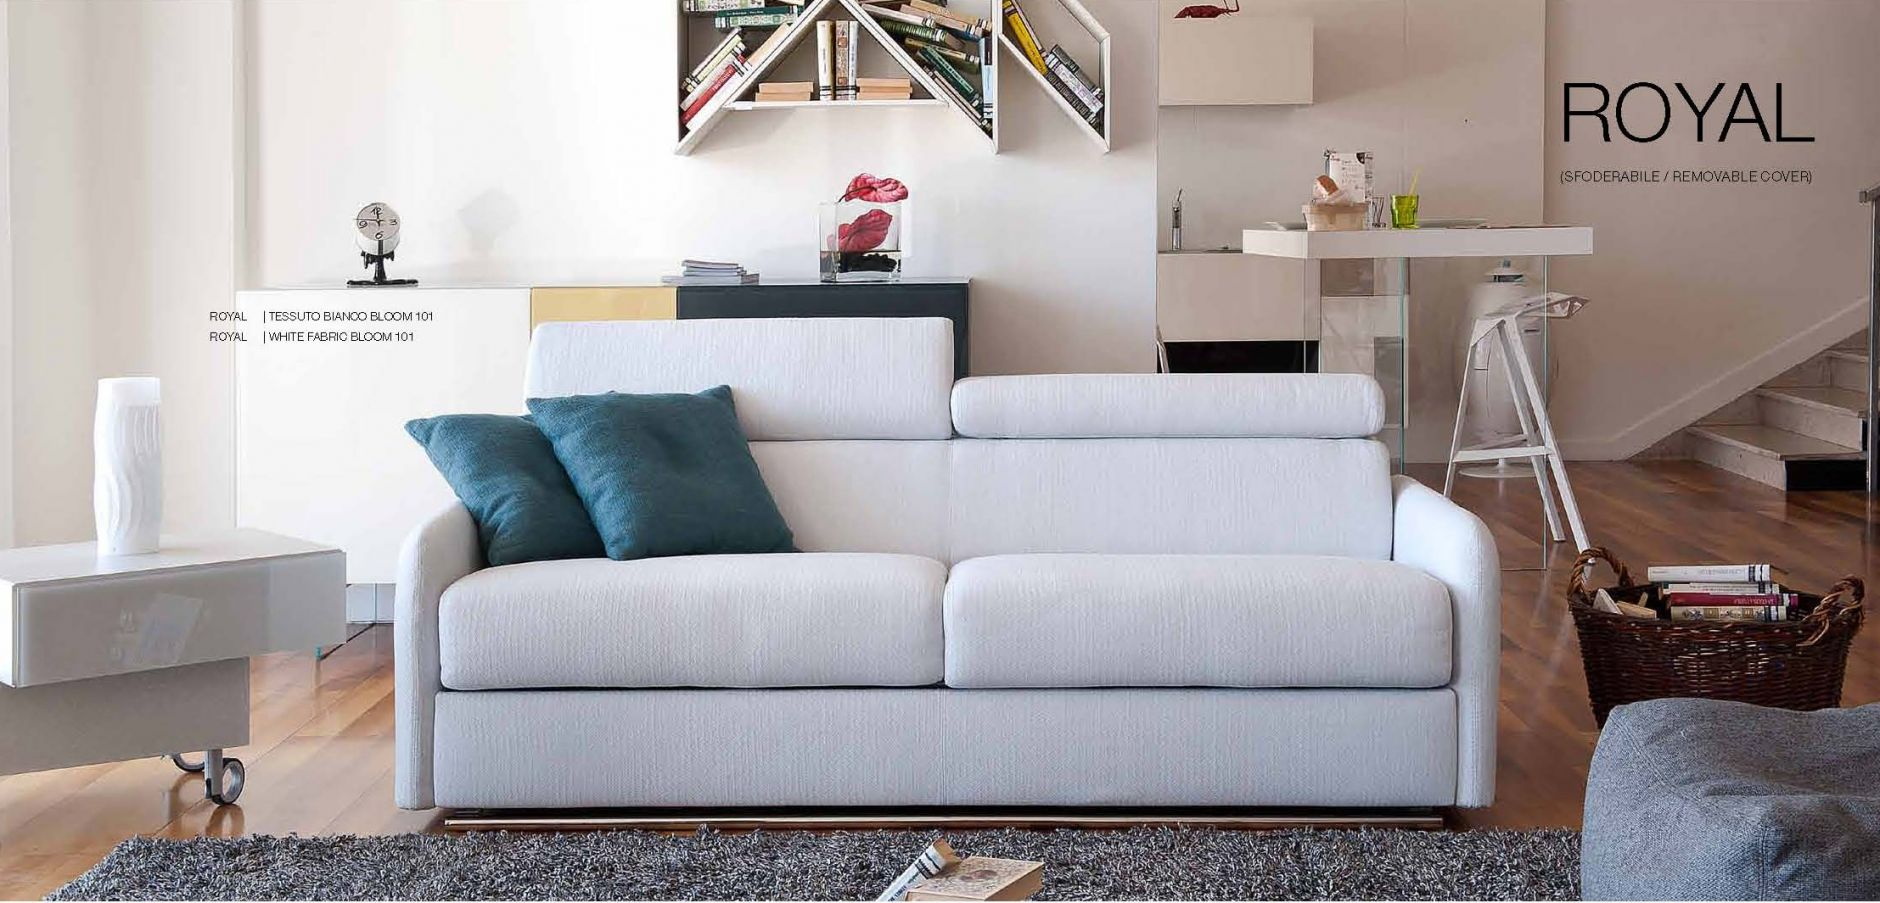 canap s italiens alpa salotti canap s rie royalles. Black Bedroom Furniture Sets. Home Design Ideas